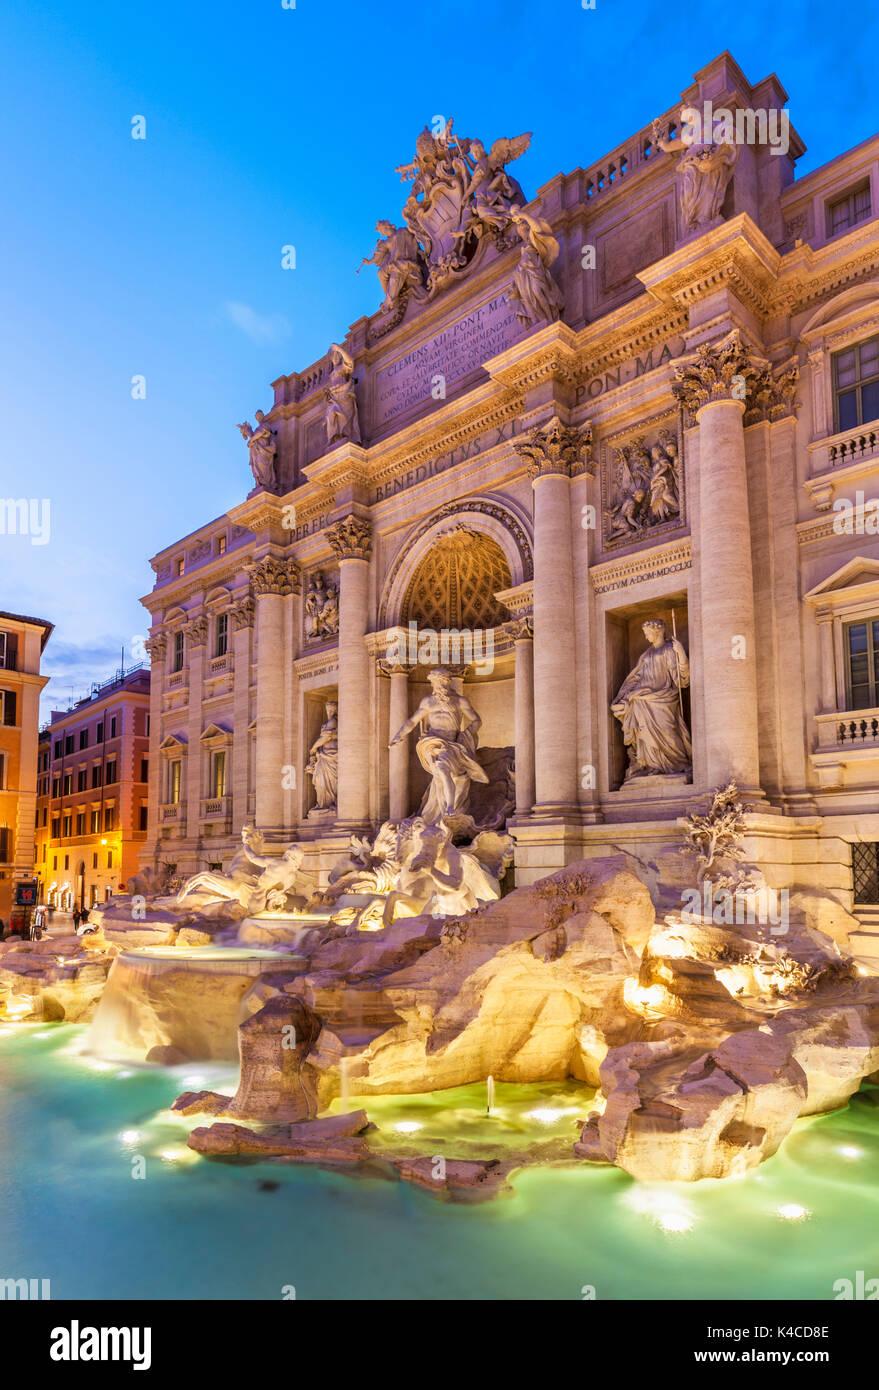 Italie Rome la fontaine de Trevi soutenu par le Palazzo Poli illuminée la nuit Rome Italie Latium eu Europe Photo Stock